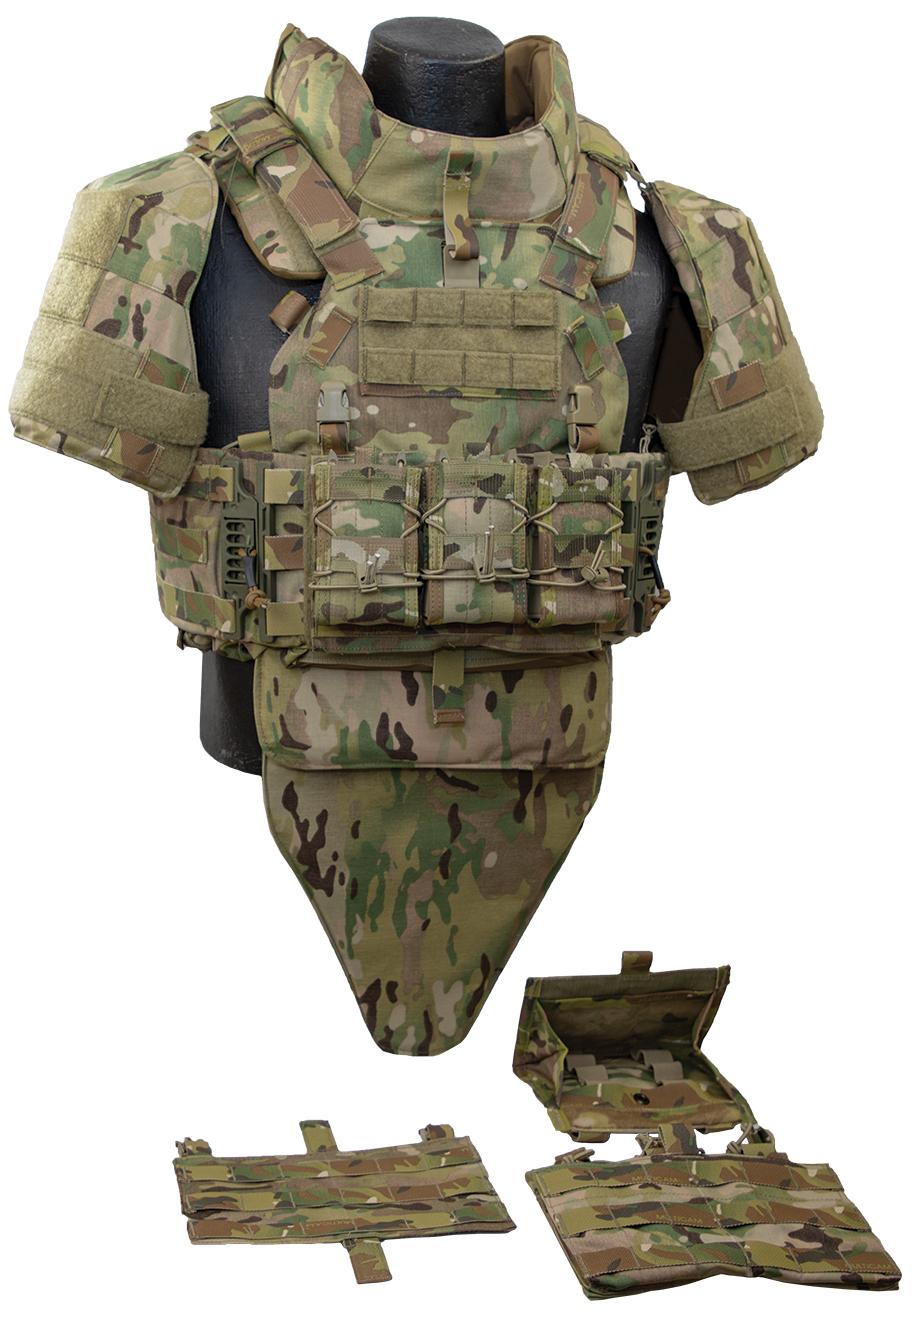 ICE_body_armor_front_web.jpg